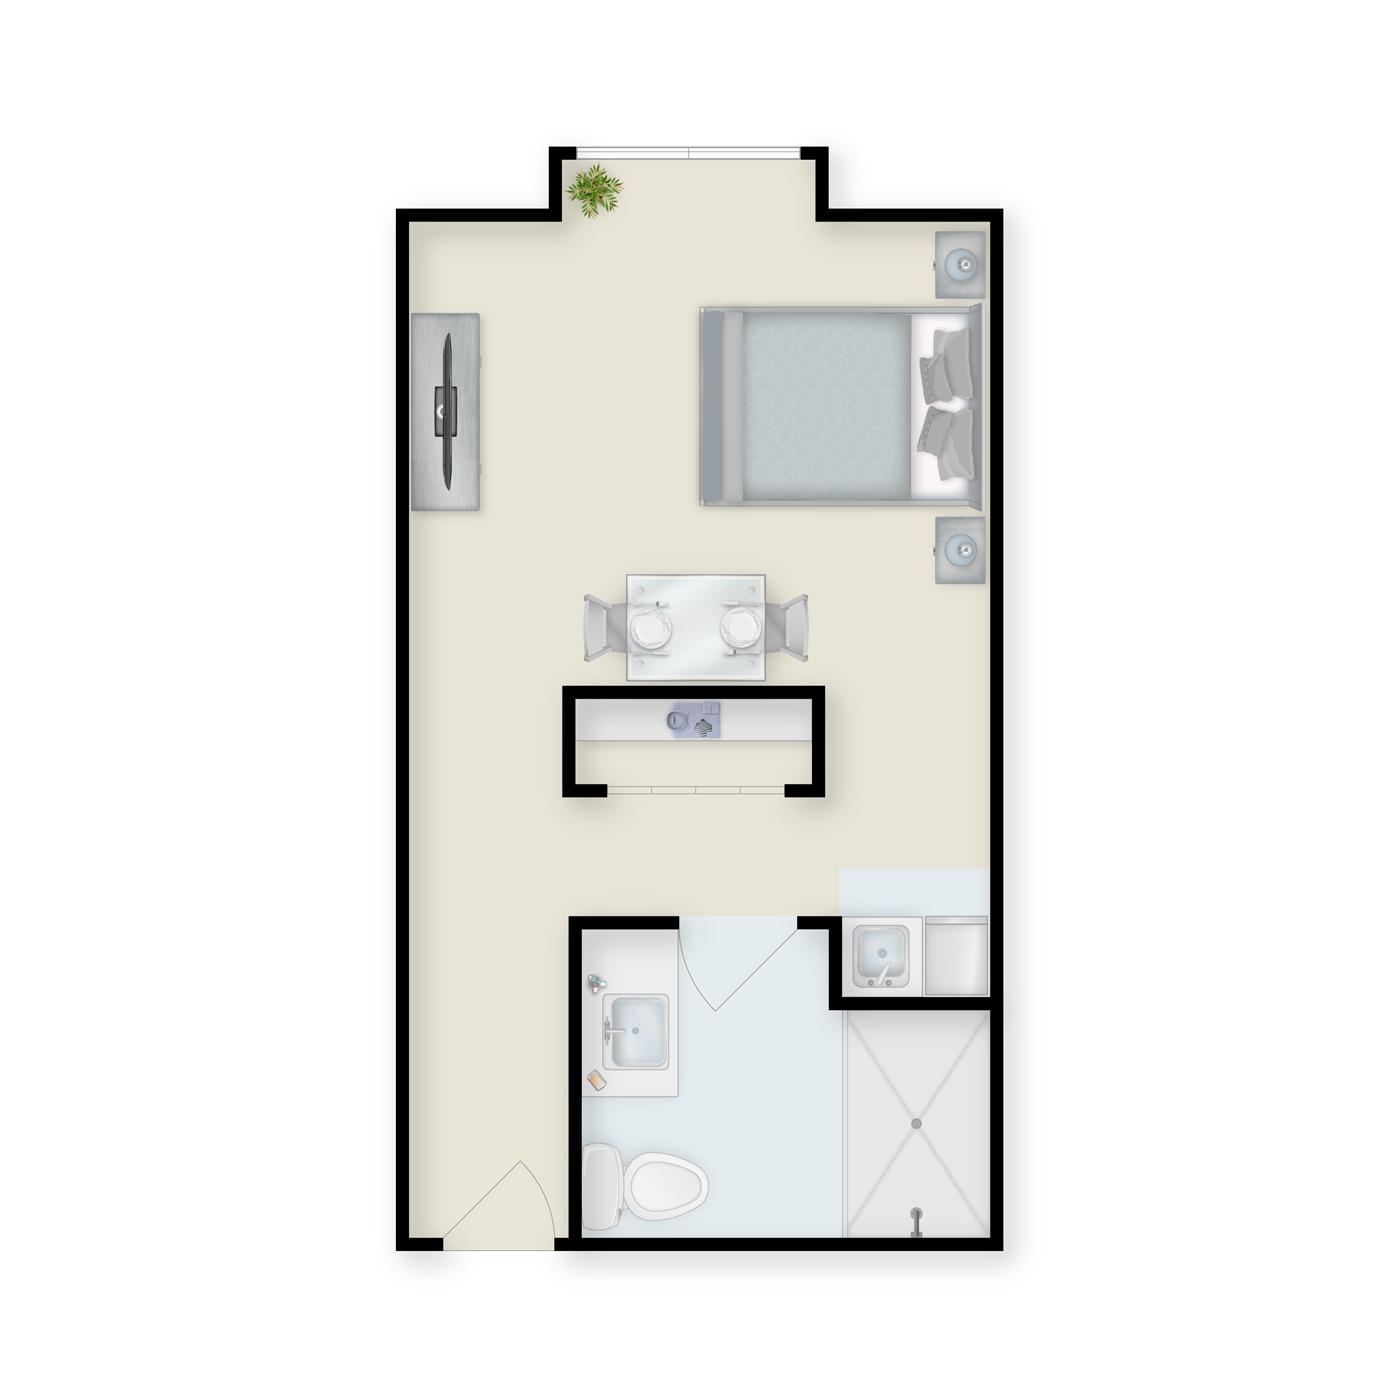 Floor plans of studio memory care apartment at Charter Senior Living of Buford